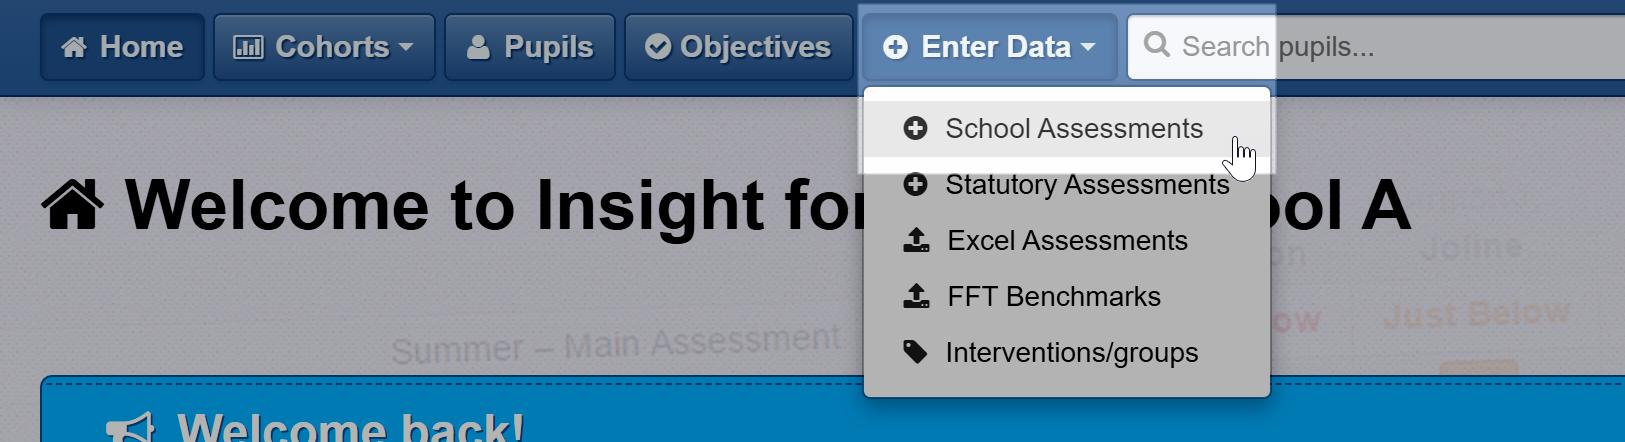 Navigate to Enter Data > School Assessments